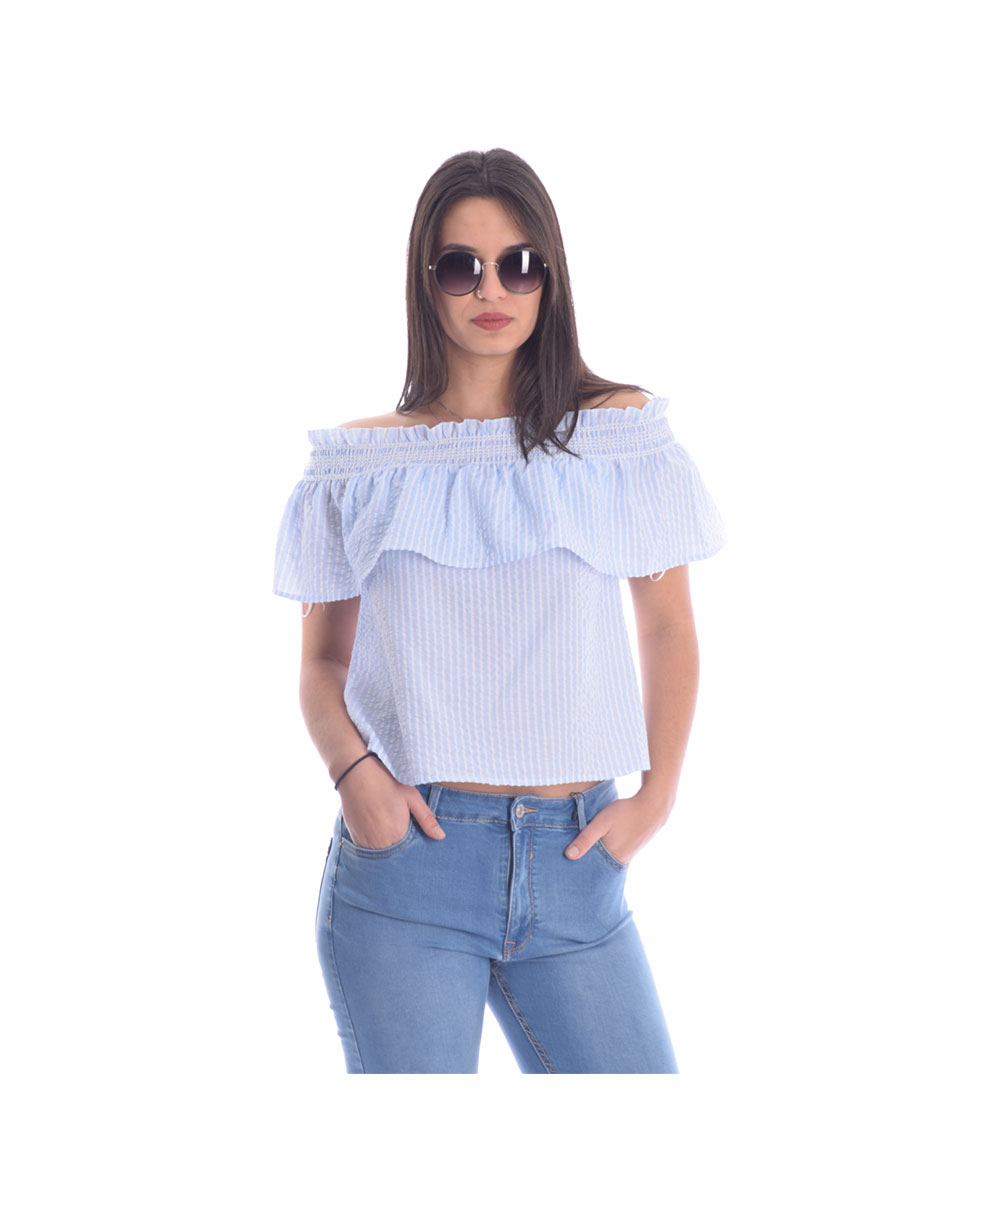 2423a8ac16df galazio leuko crop top strapless italiko italian spring summer 2019 alcott